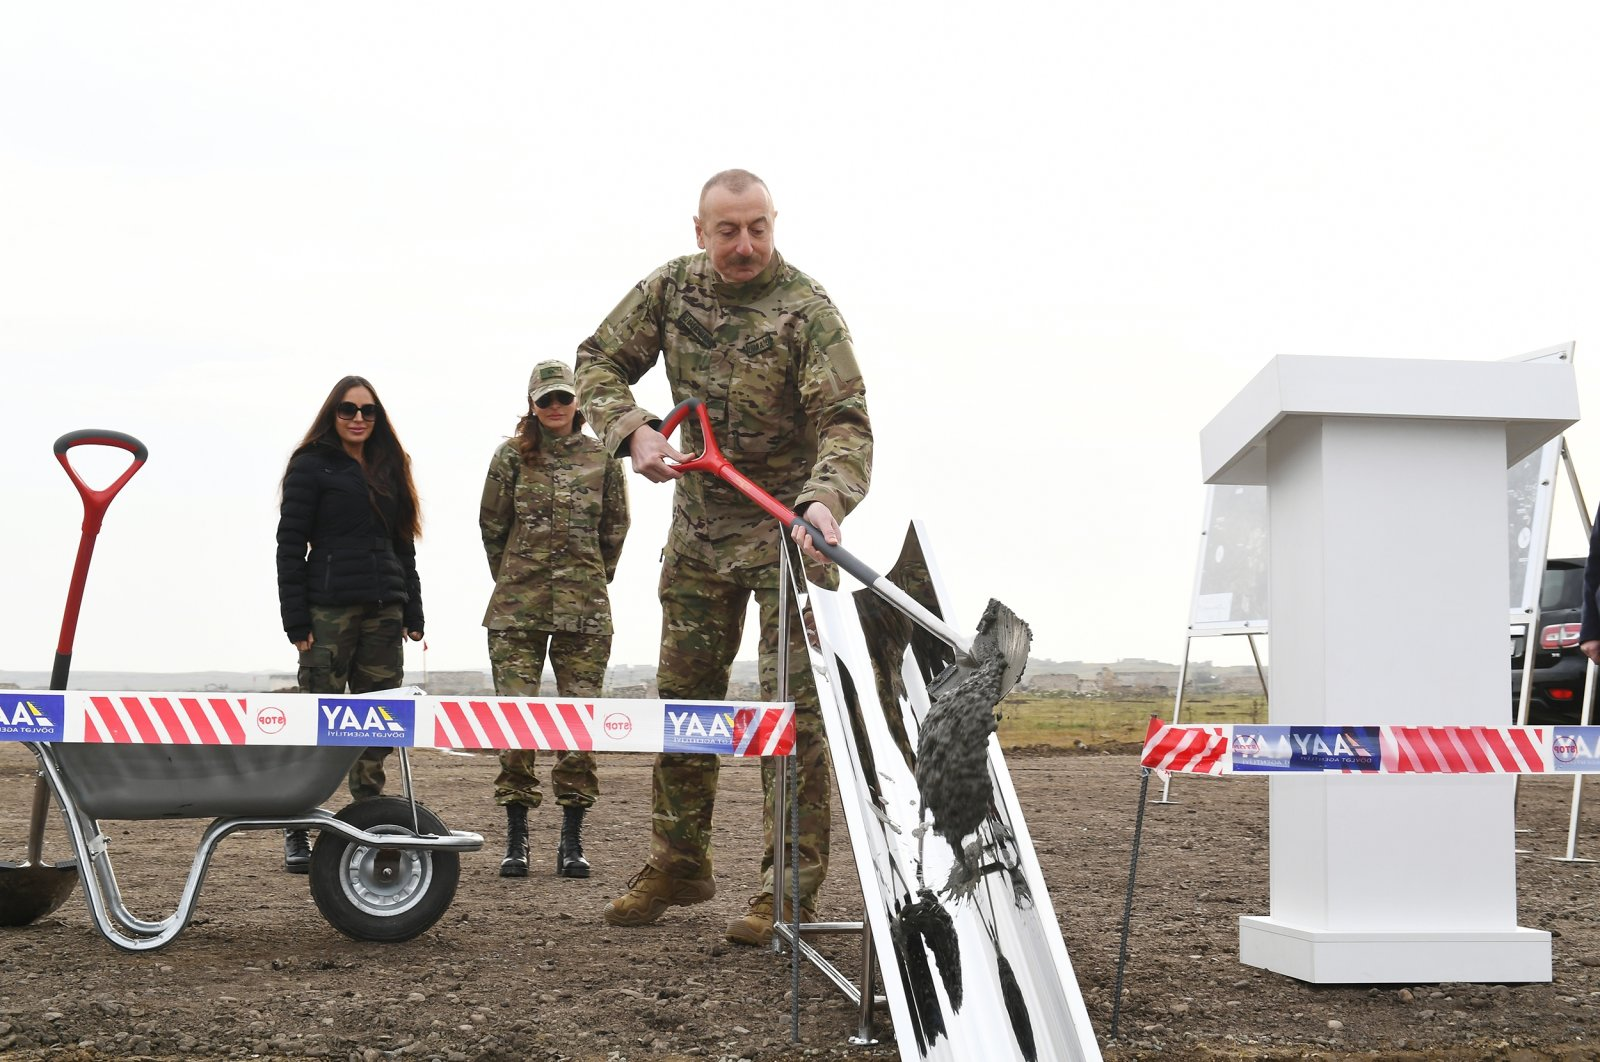 Azerbaijani President Ilham Aliyev pours concrete to inaugurate the construction of a new airport in Fuzuli, Azerbaijan, Jan. 15, 2021. (AA Photo)